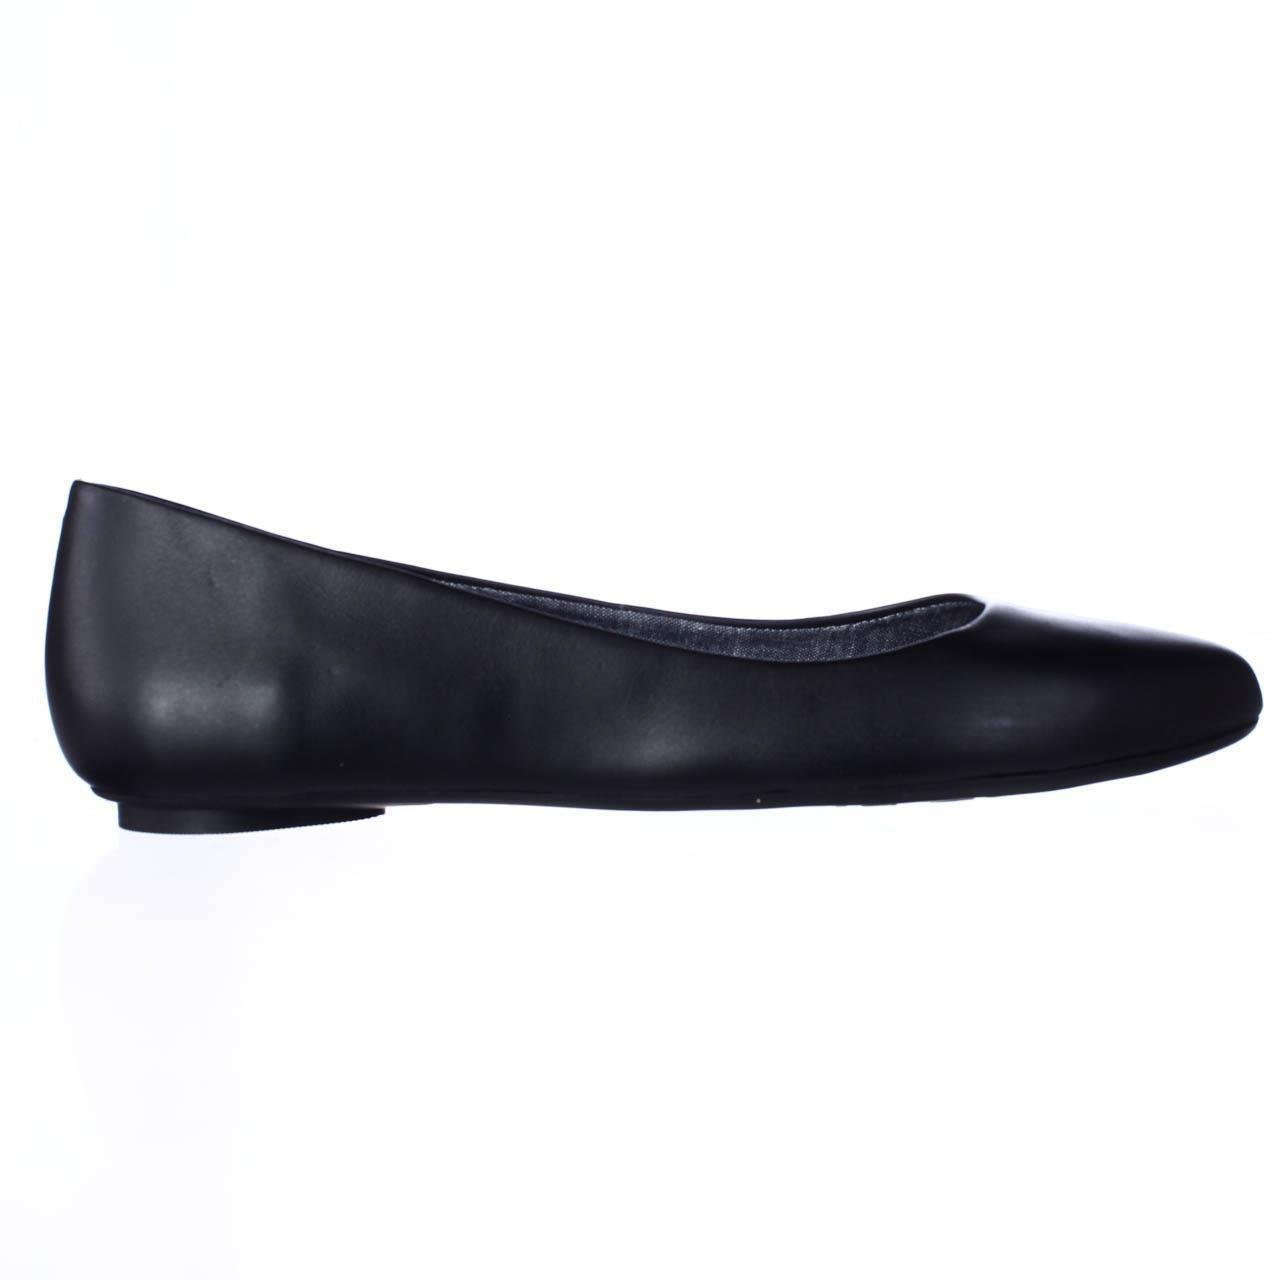 d3fcb062e317 Lyst - Dr. Scholls Really Cool Fit Memory Foam Ballet Flats in Black